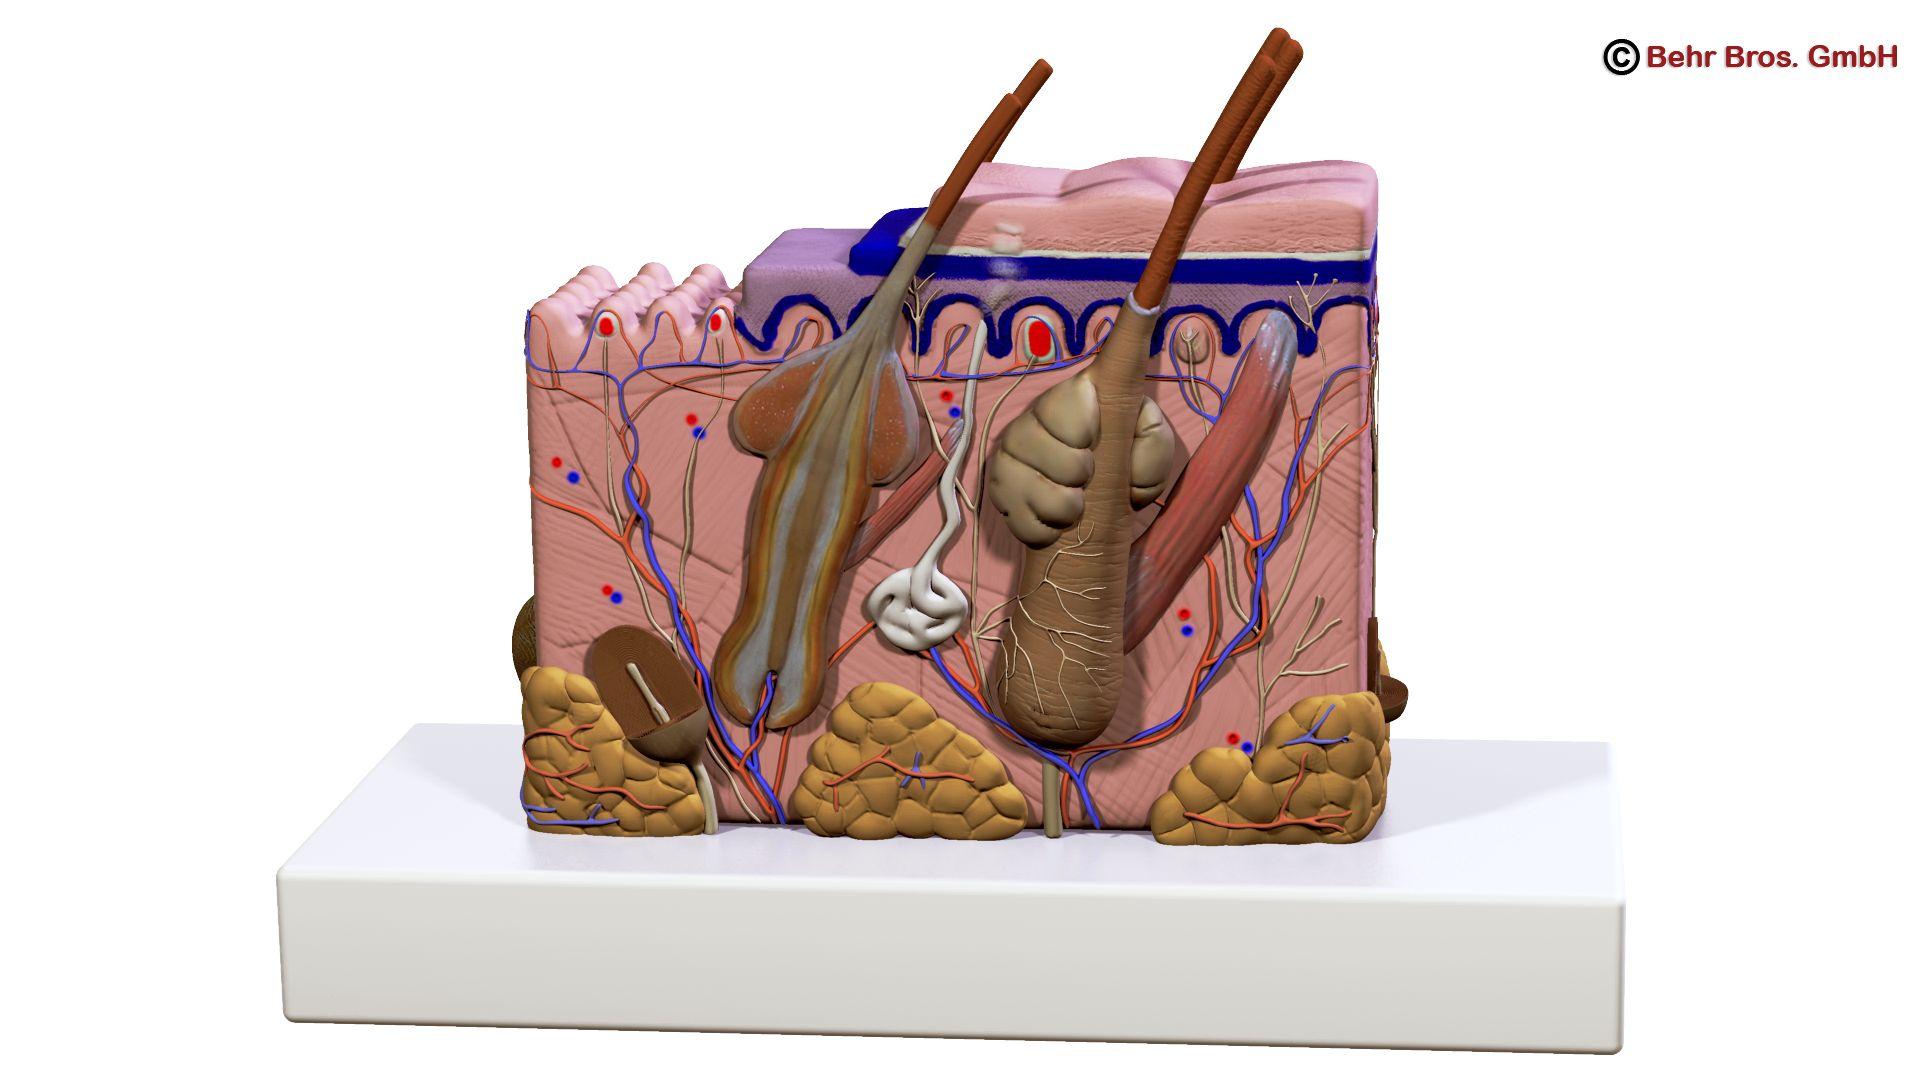 Human Skin Section 3d model 3ds max fbx c4d lwo lws lw ma mb obj 161734